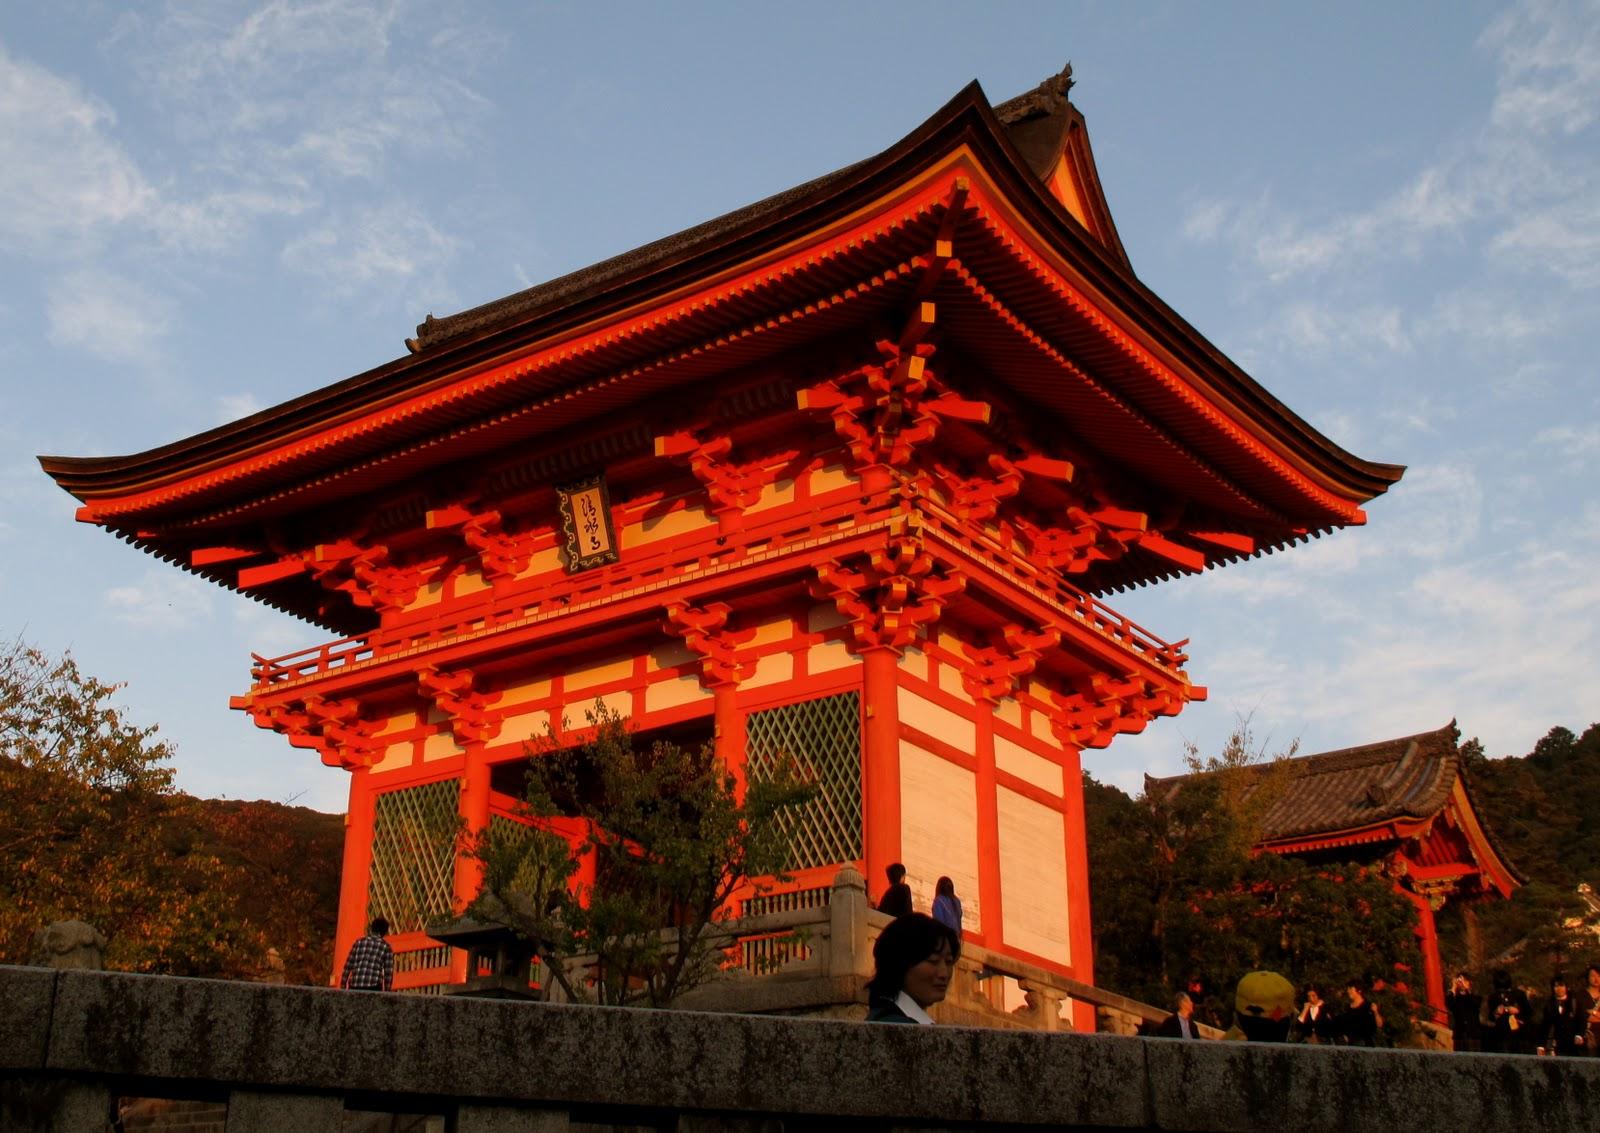 Boarder-San: Kyoto Temples,Shrines and Shogun Castles.